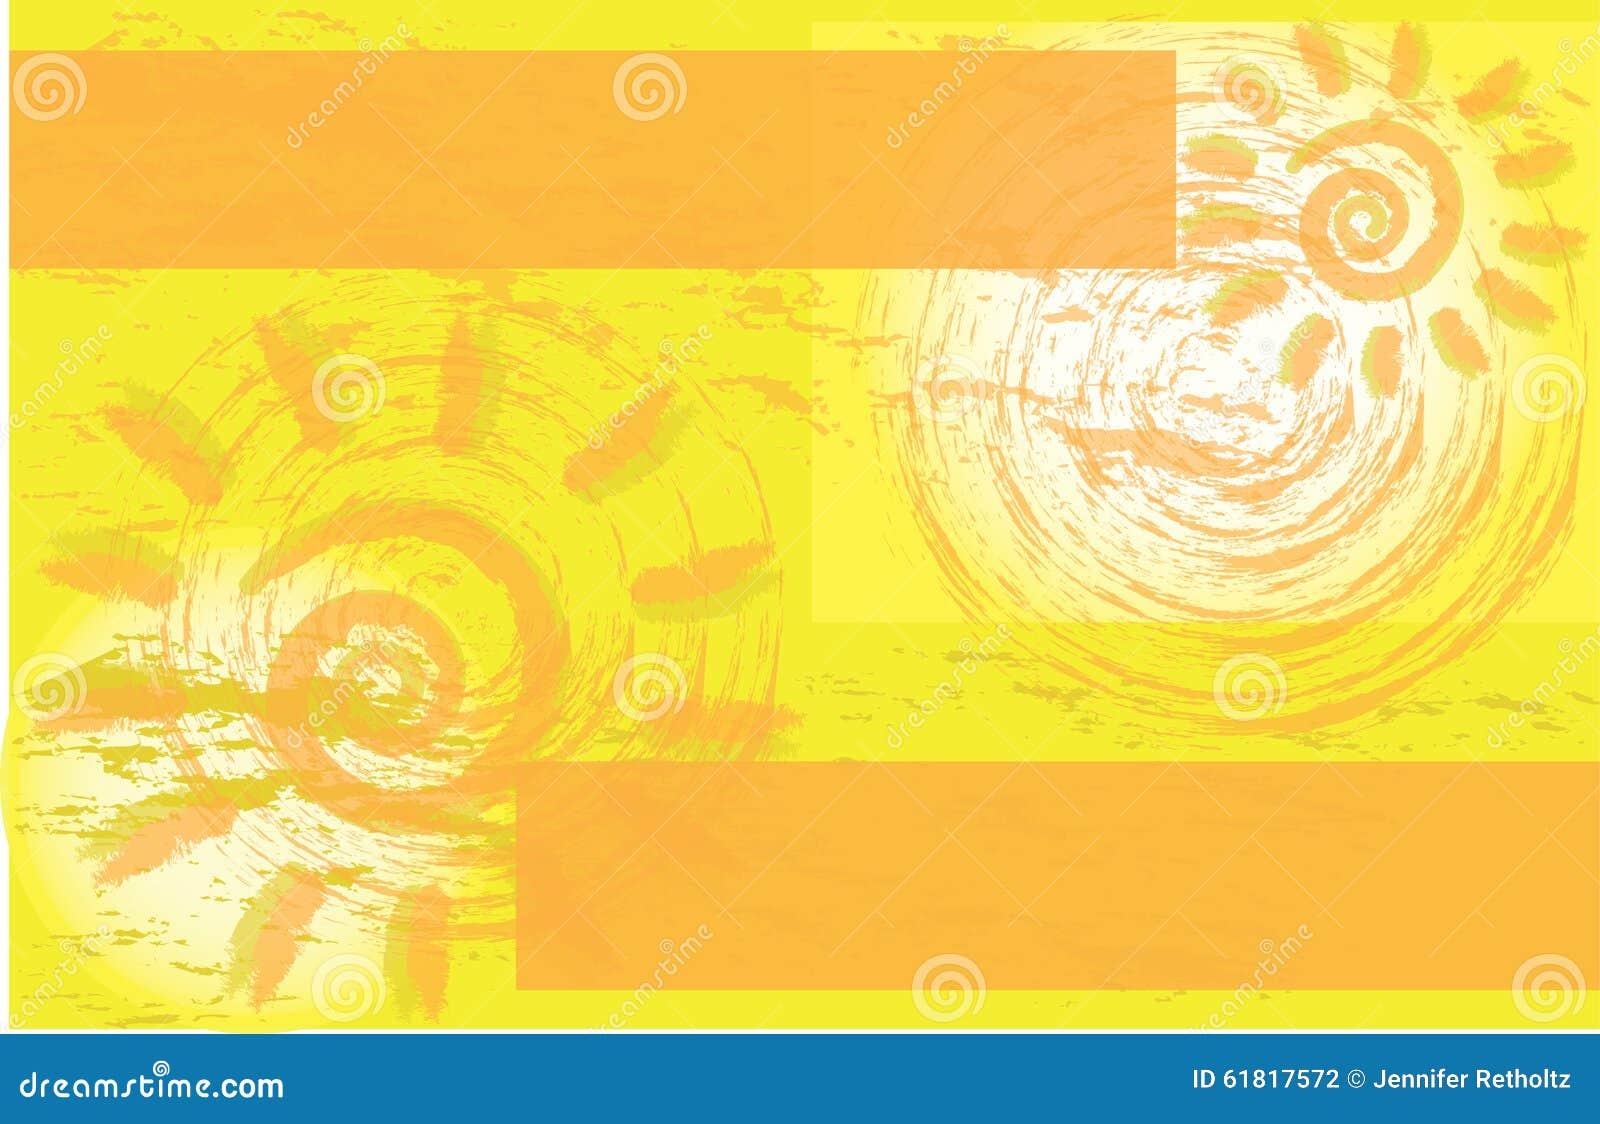 yellow sun corporate event flyer brochure stock